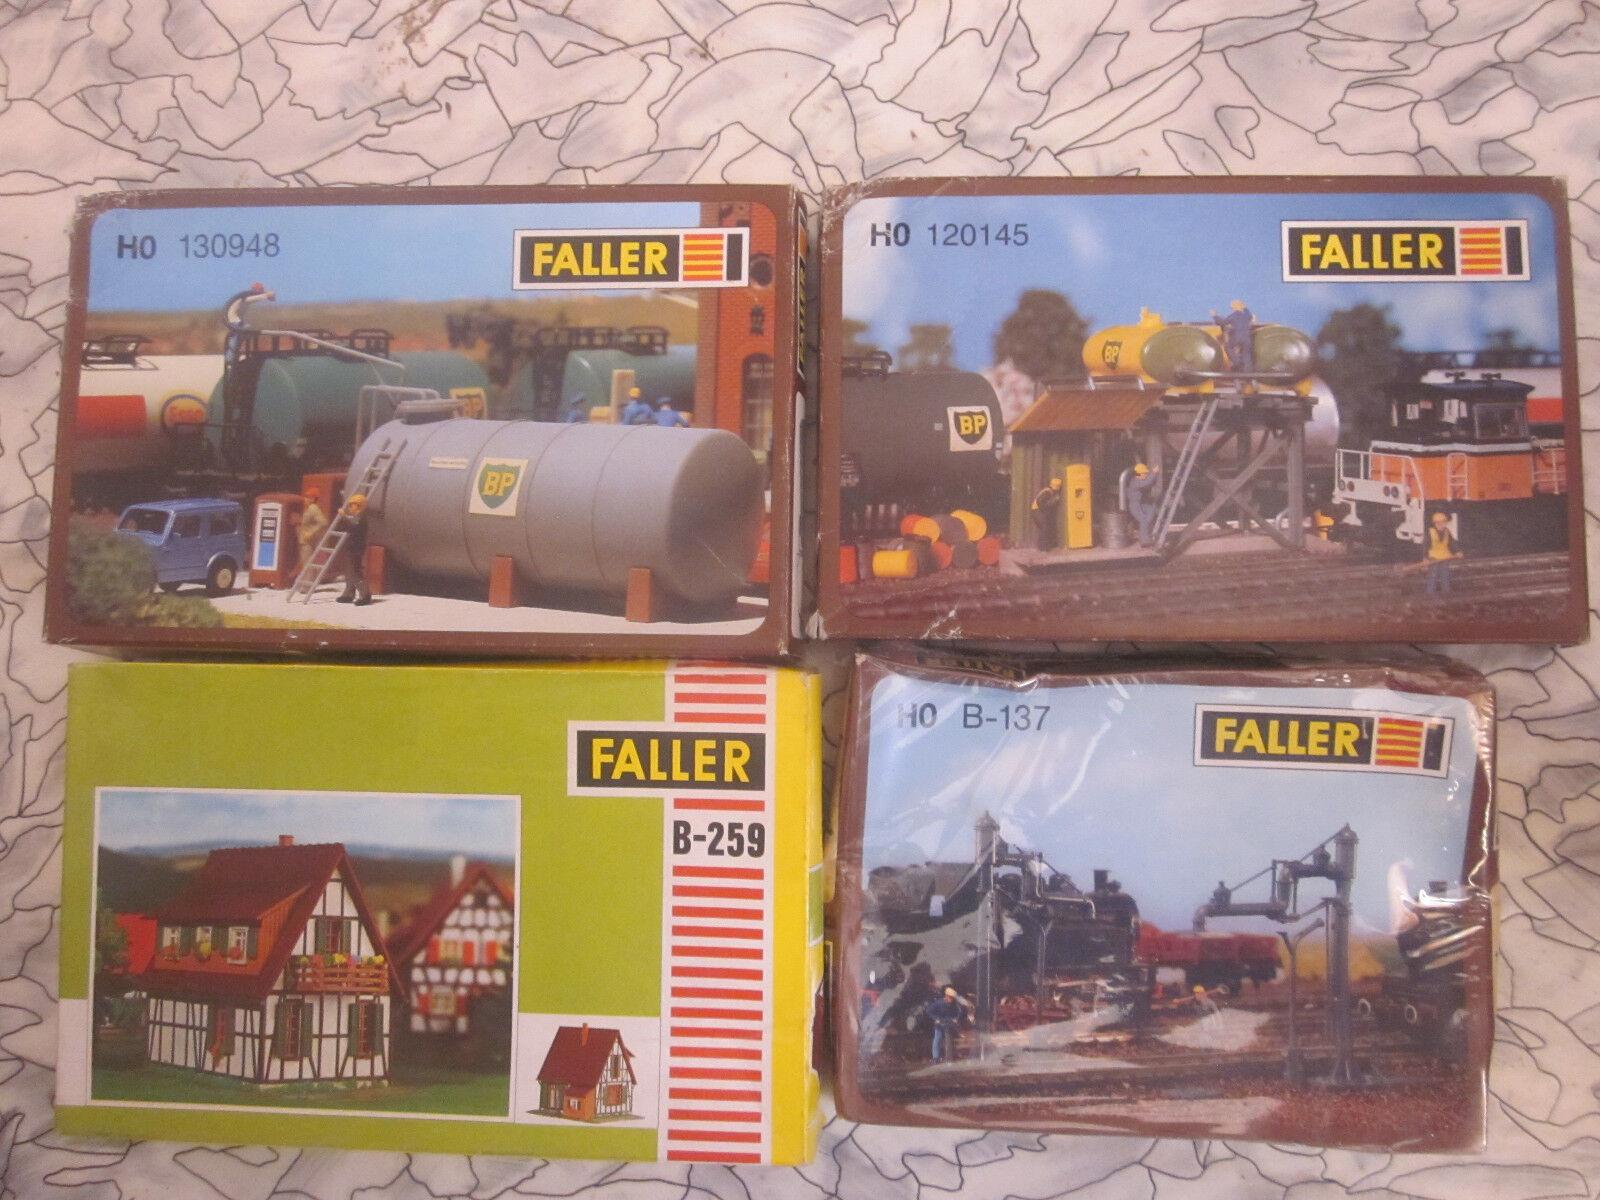 Ftuttier h0 120145 130948 b-259 b-137 b-137 b-137 4 diversi KIT  NUOVO + OVP 3f5199